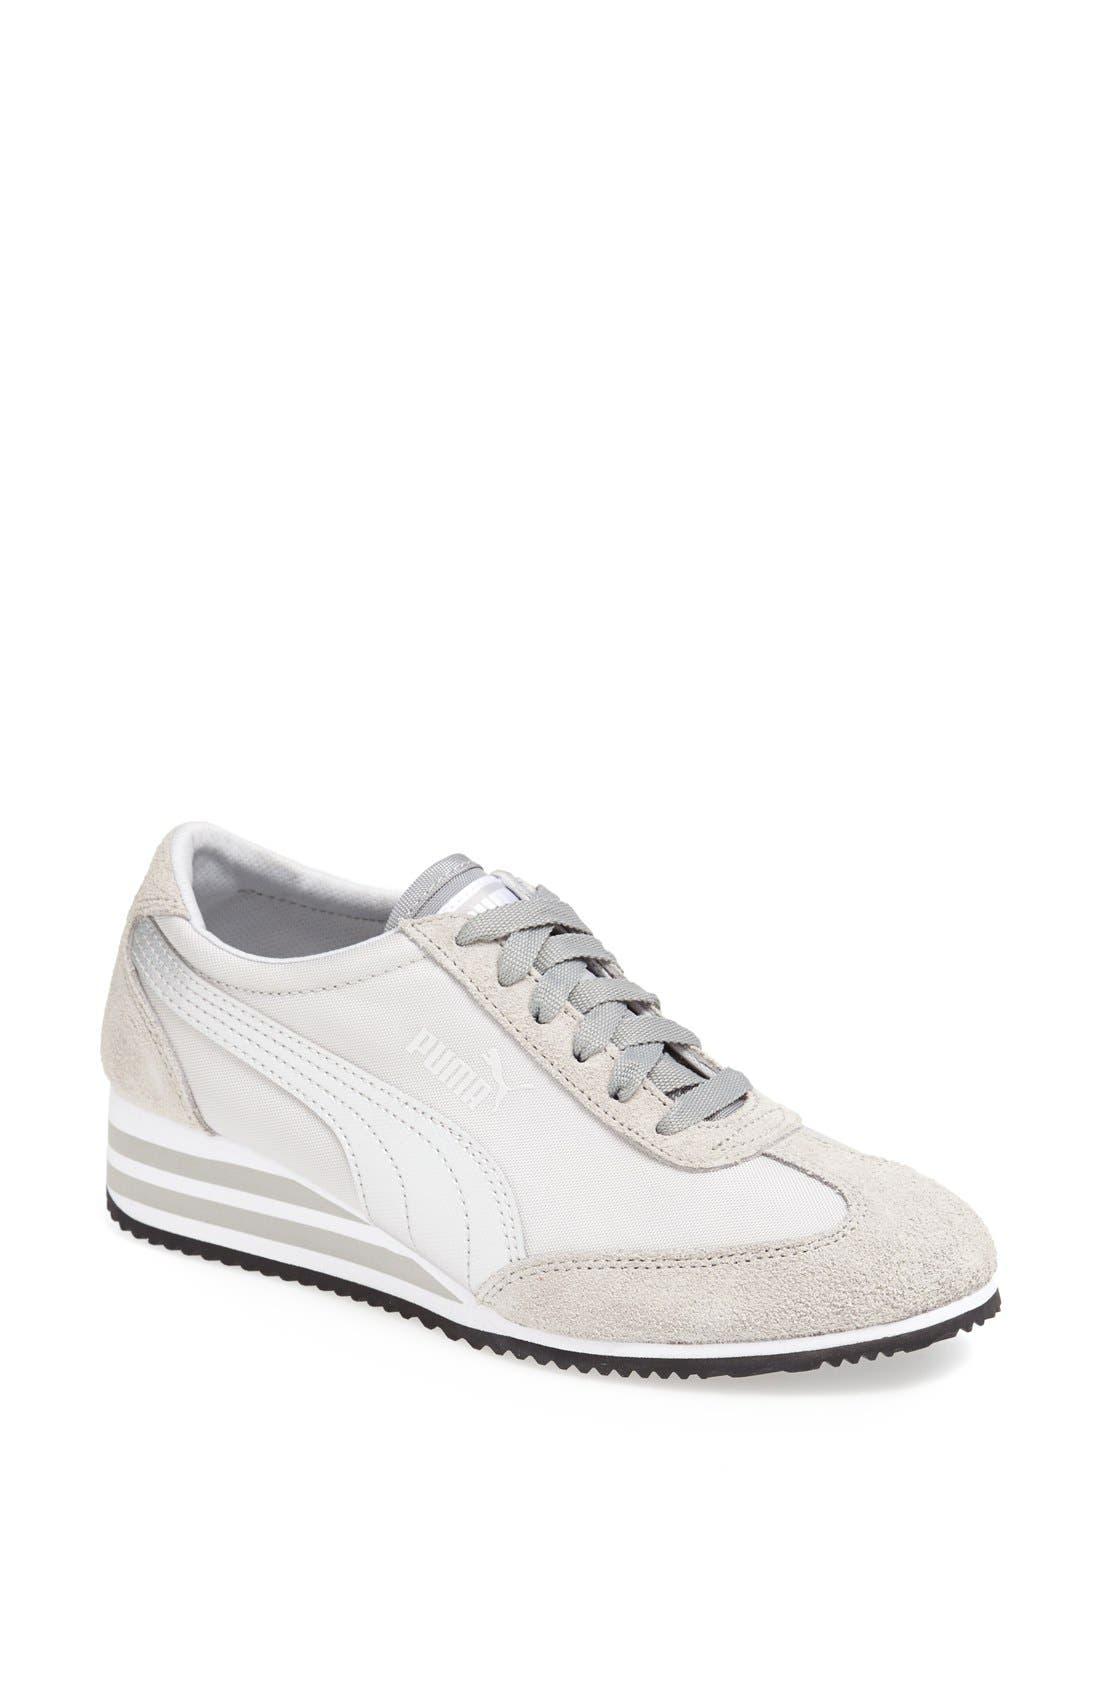 Main Image - PUMA 'Caroline Stripe' Sneaker (Women)